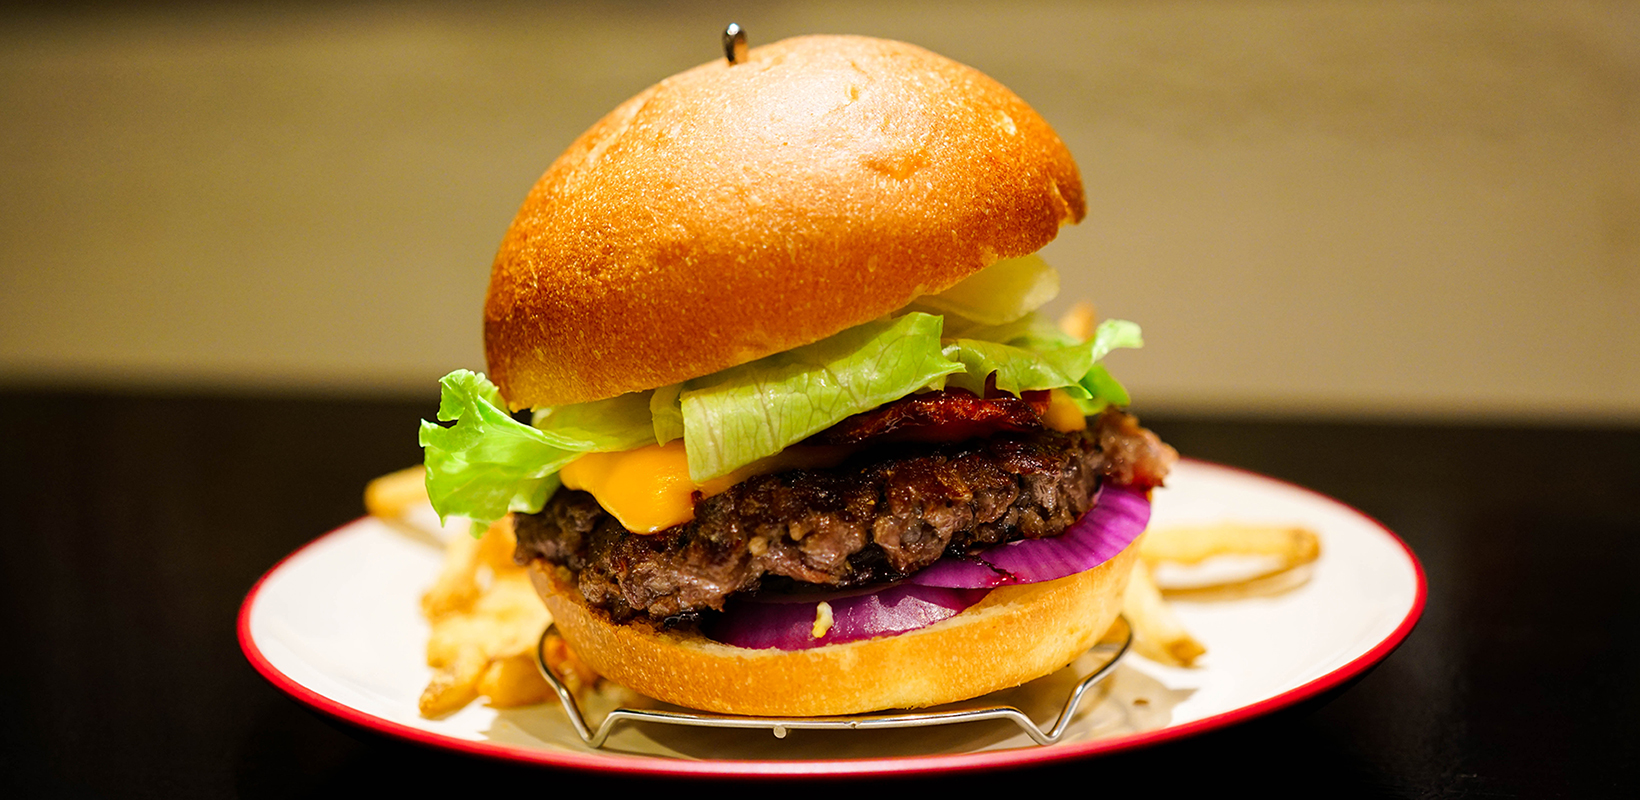 ICON –  ハンバーガー店 東京 代々木 新宿 南新宿 HAMBURGER SHOP